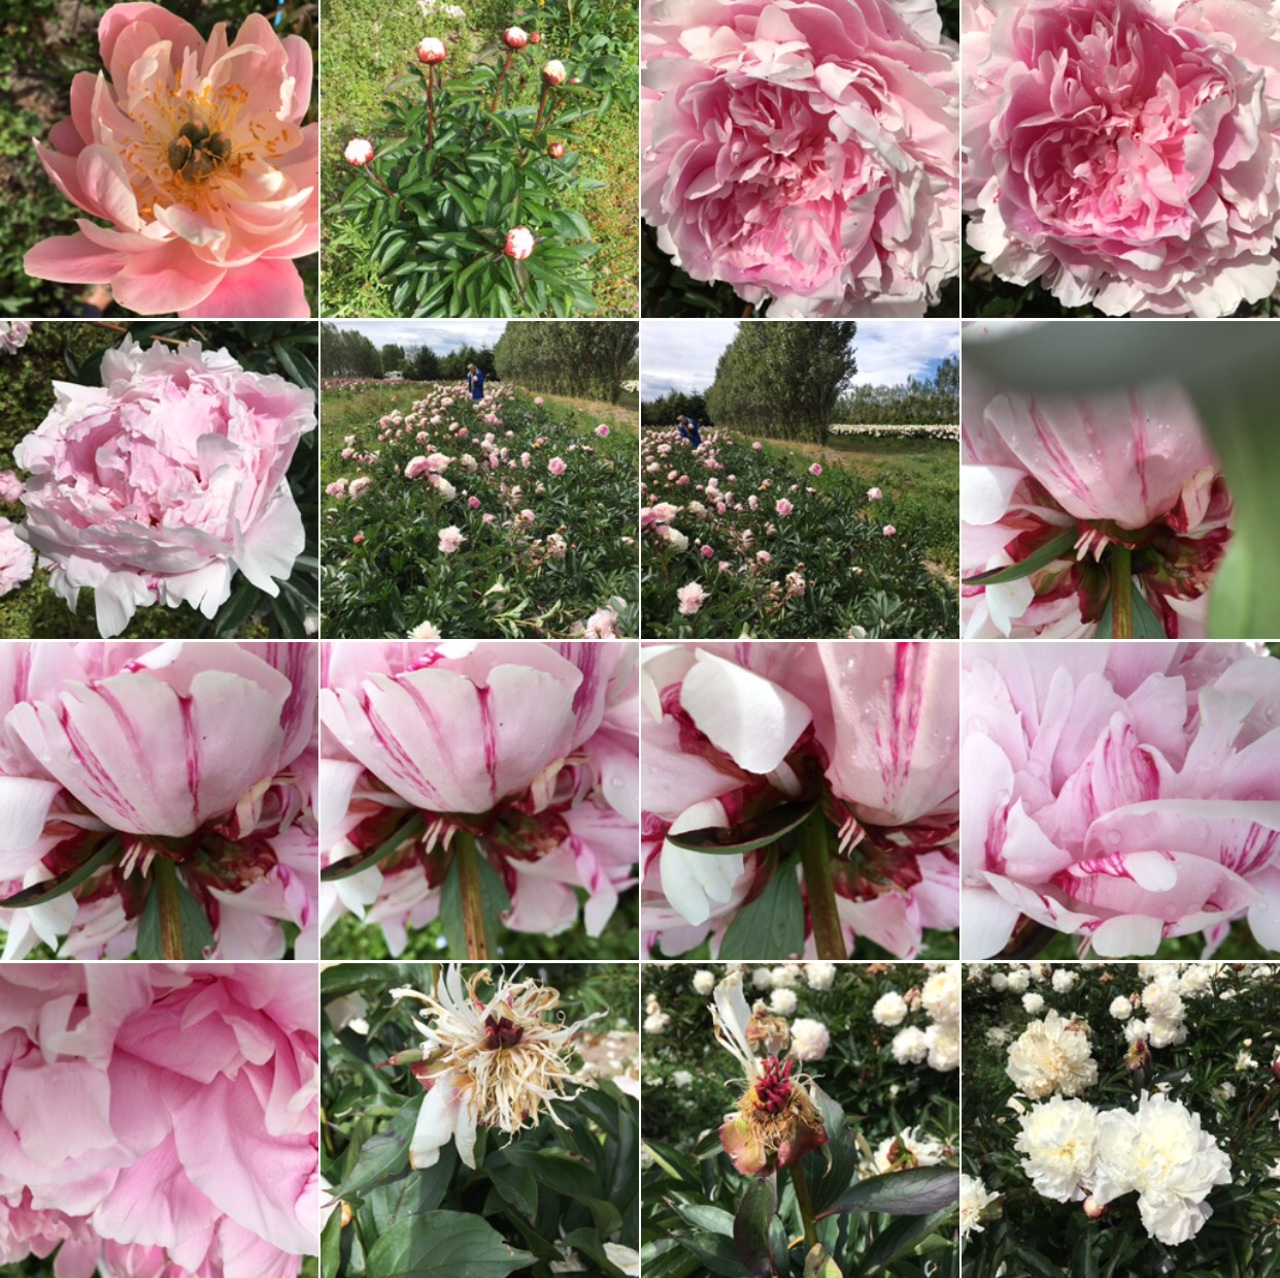 bloom there were you were born Bloom there where you were born сочинение реклама попроси больше объяснений.